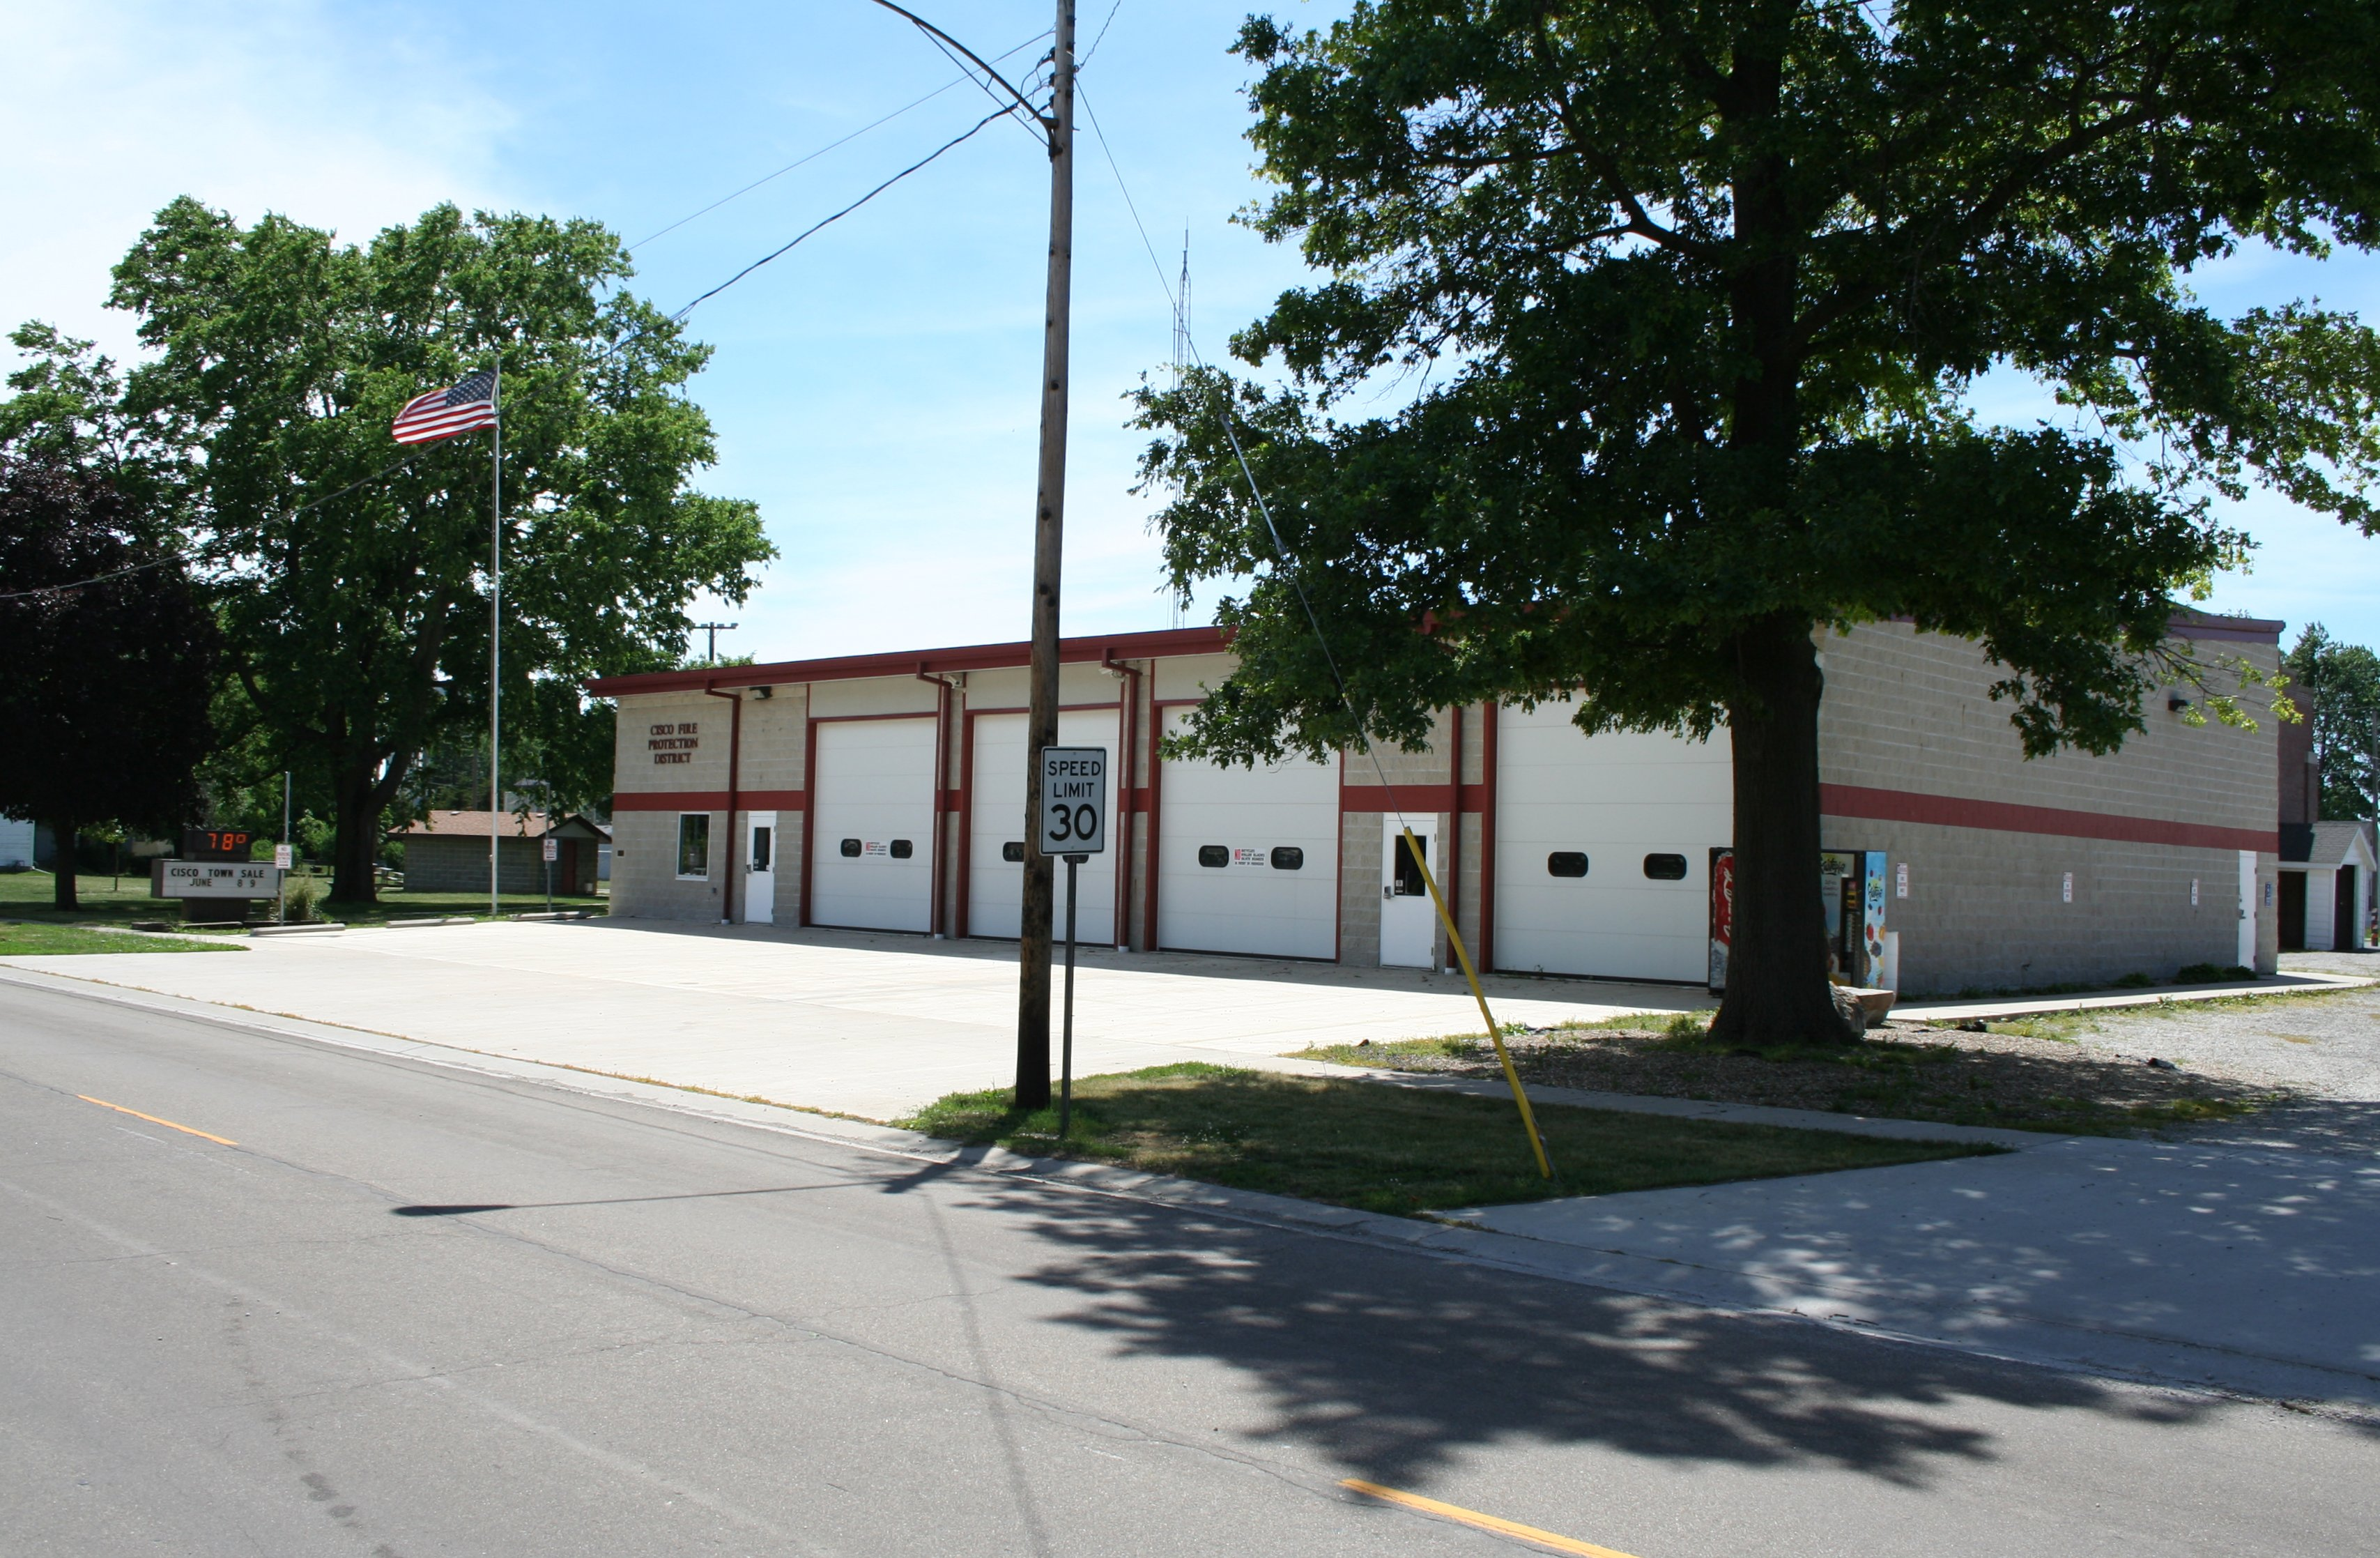 Illinois piatt county cisco - File Cisco Illinois Fire Station Jpg